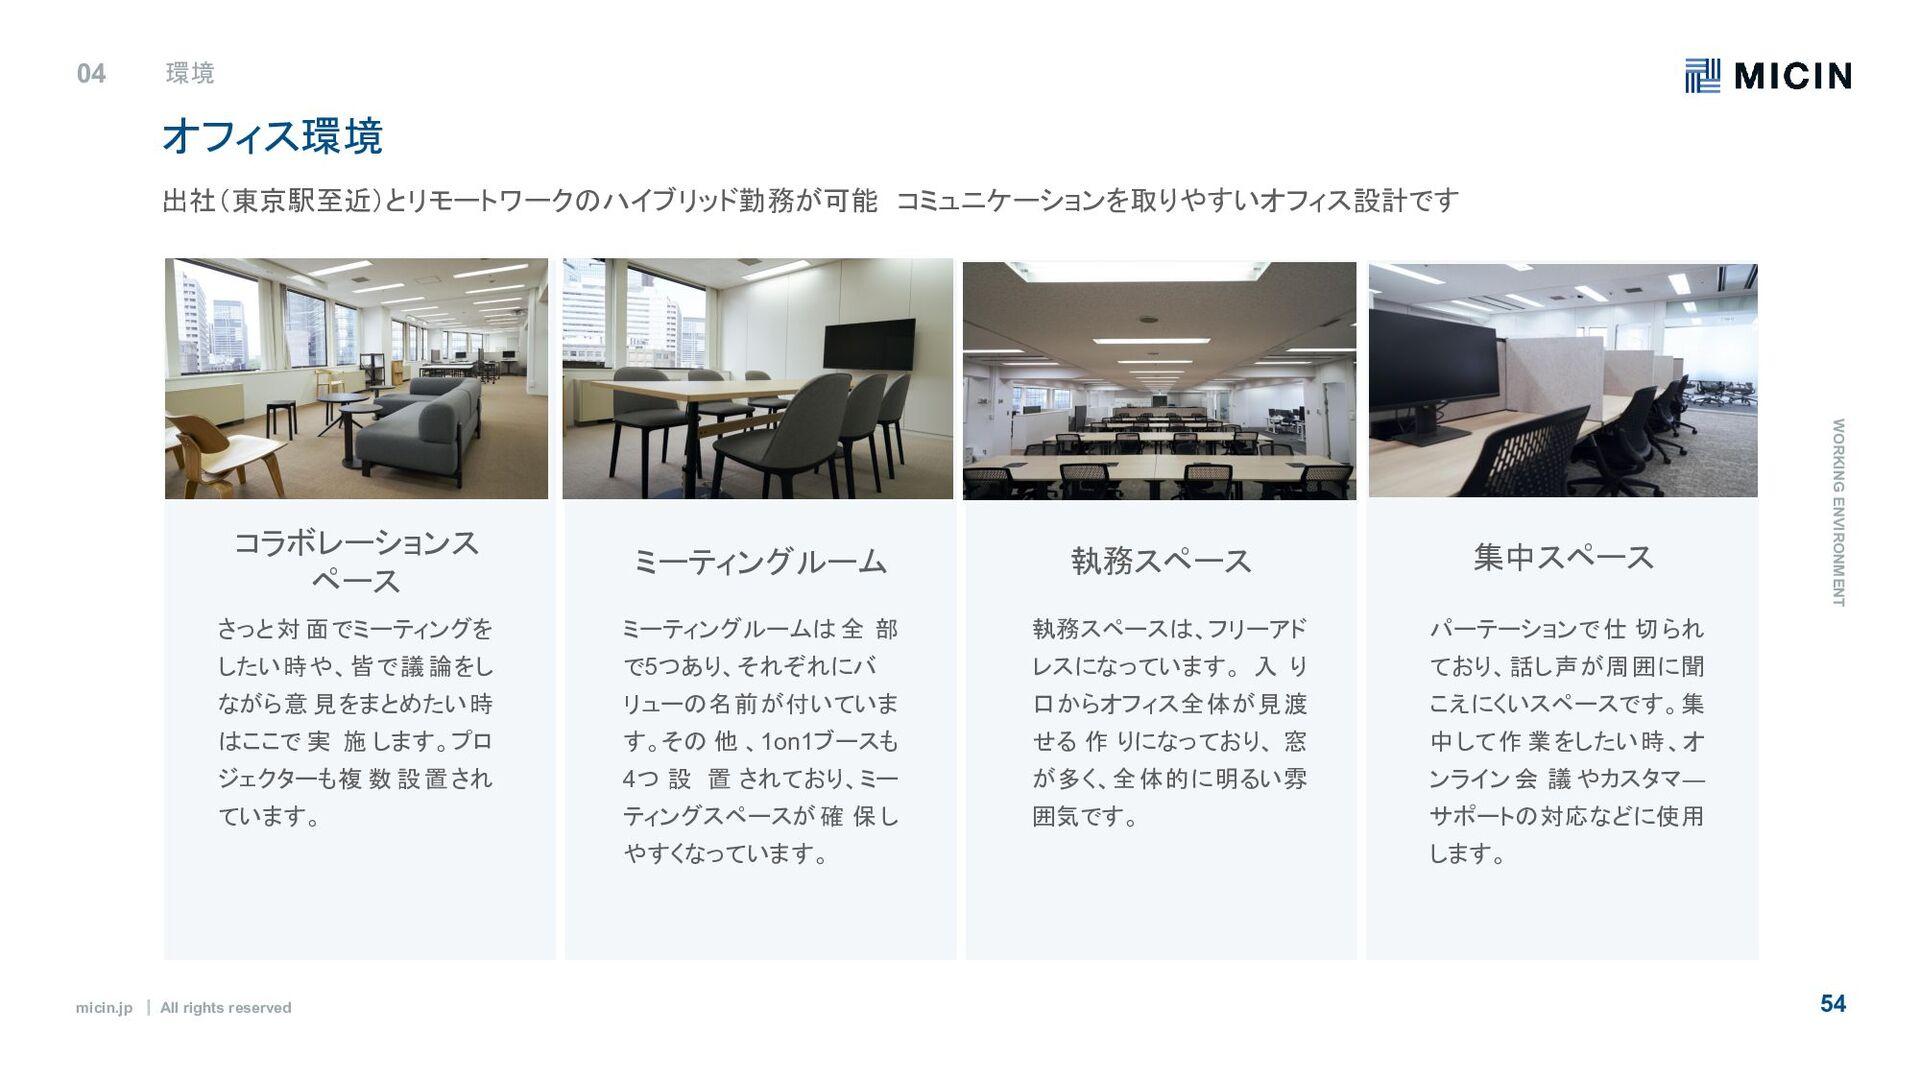 micin.jp ʛ All rights reserved 54 相互理解・コミュニケーショ...